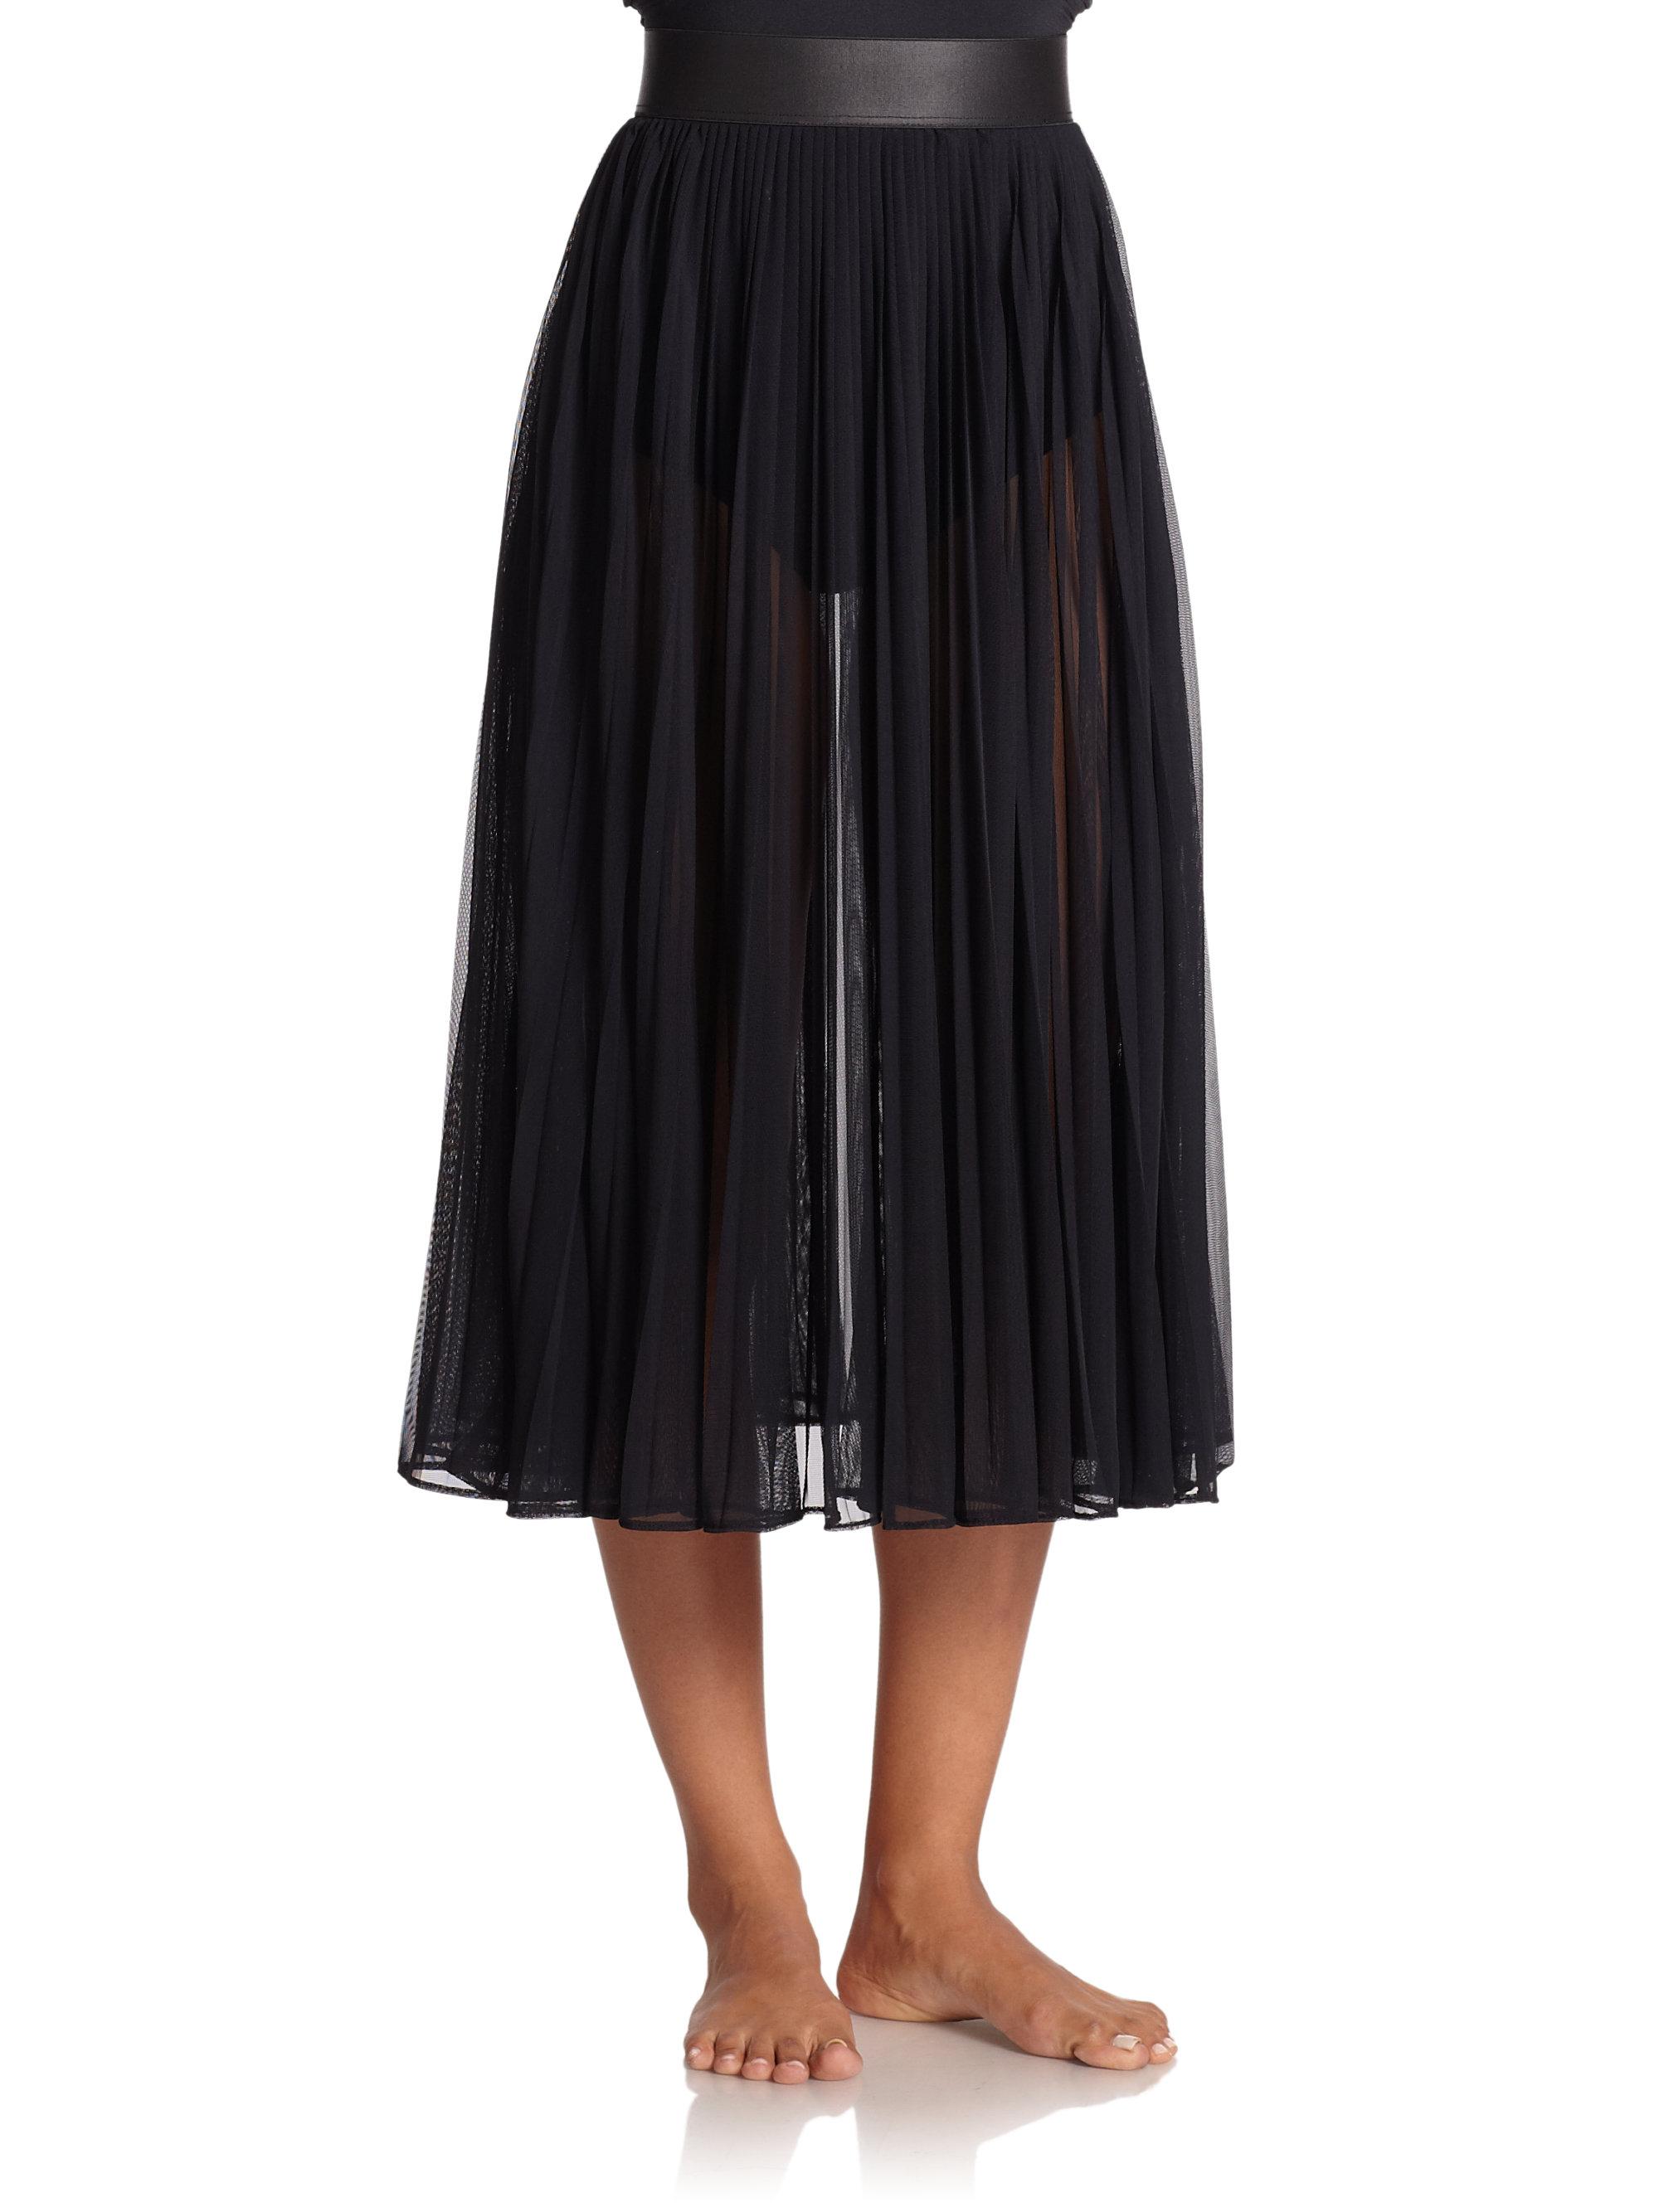 Carmen marc valvo Chiffon Midi Skirt Coverup in Black | Lyst